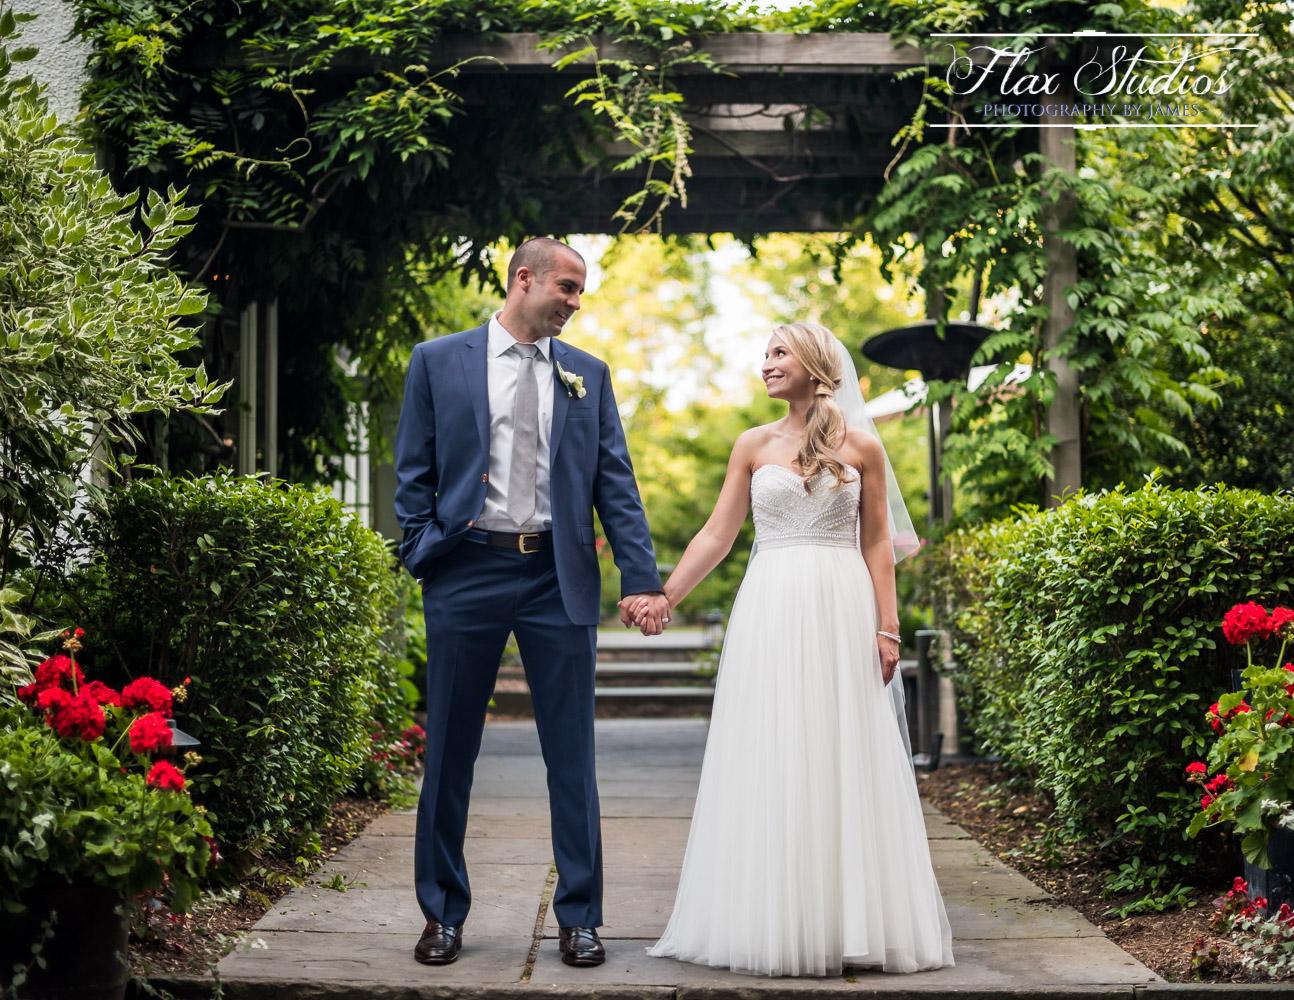 Flax Studios Wedding Photographer